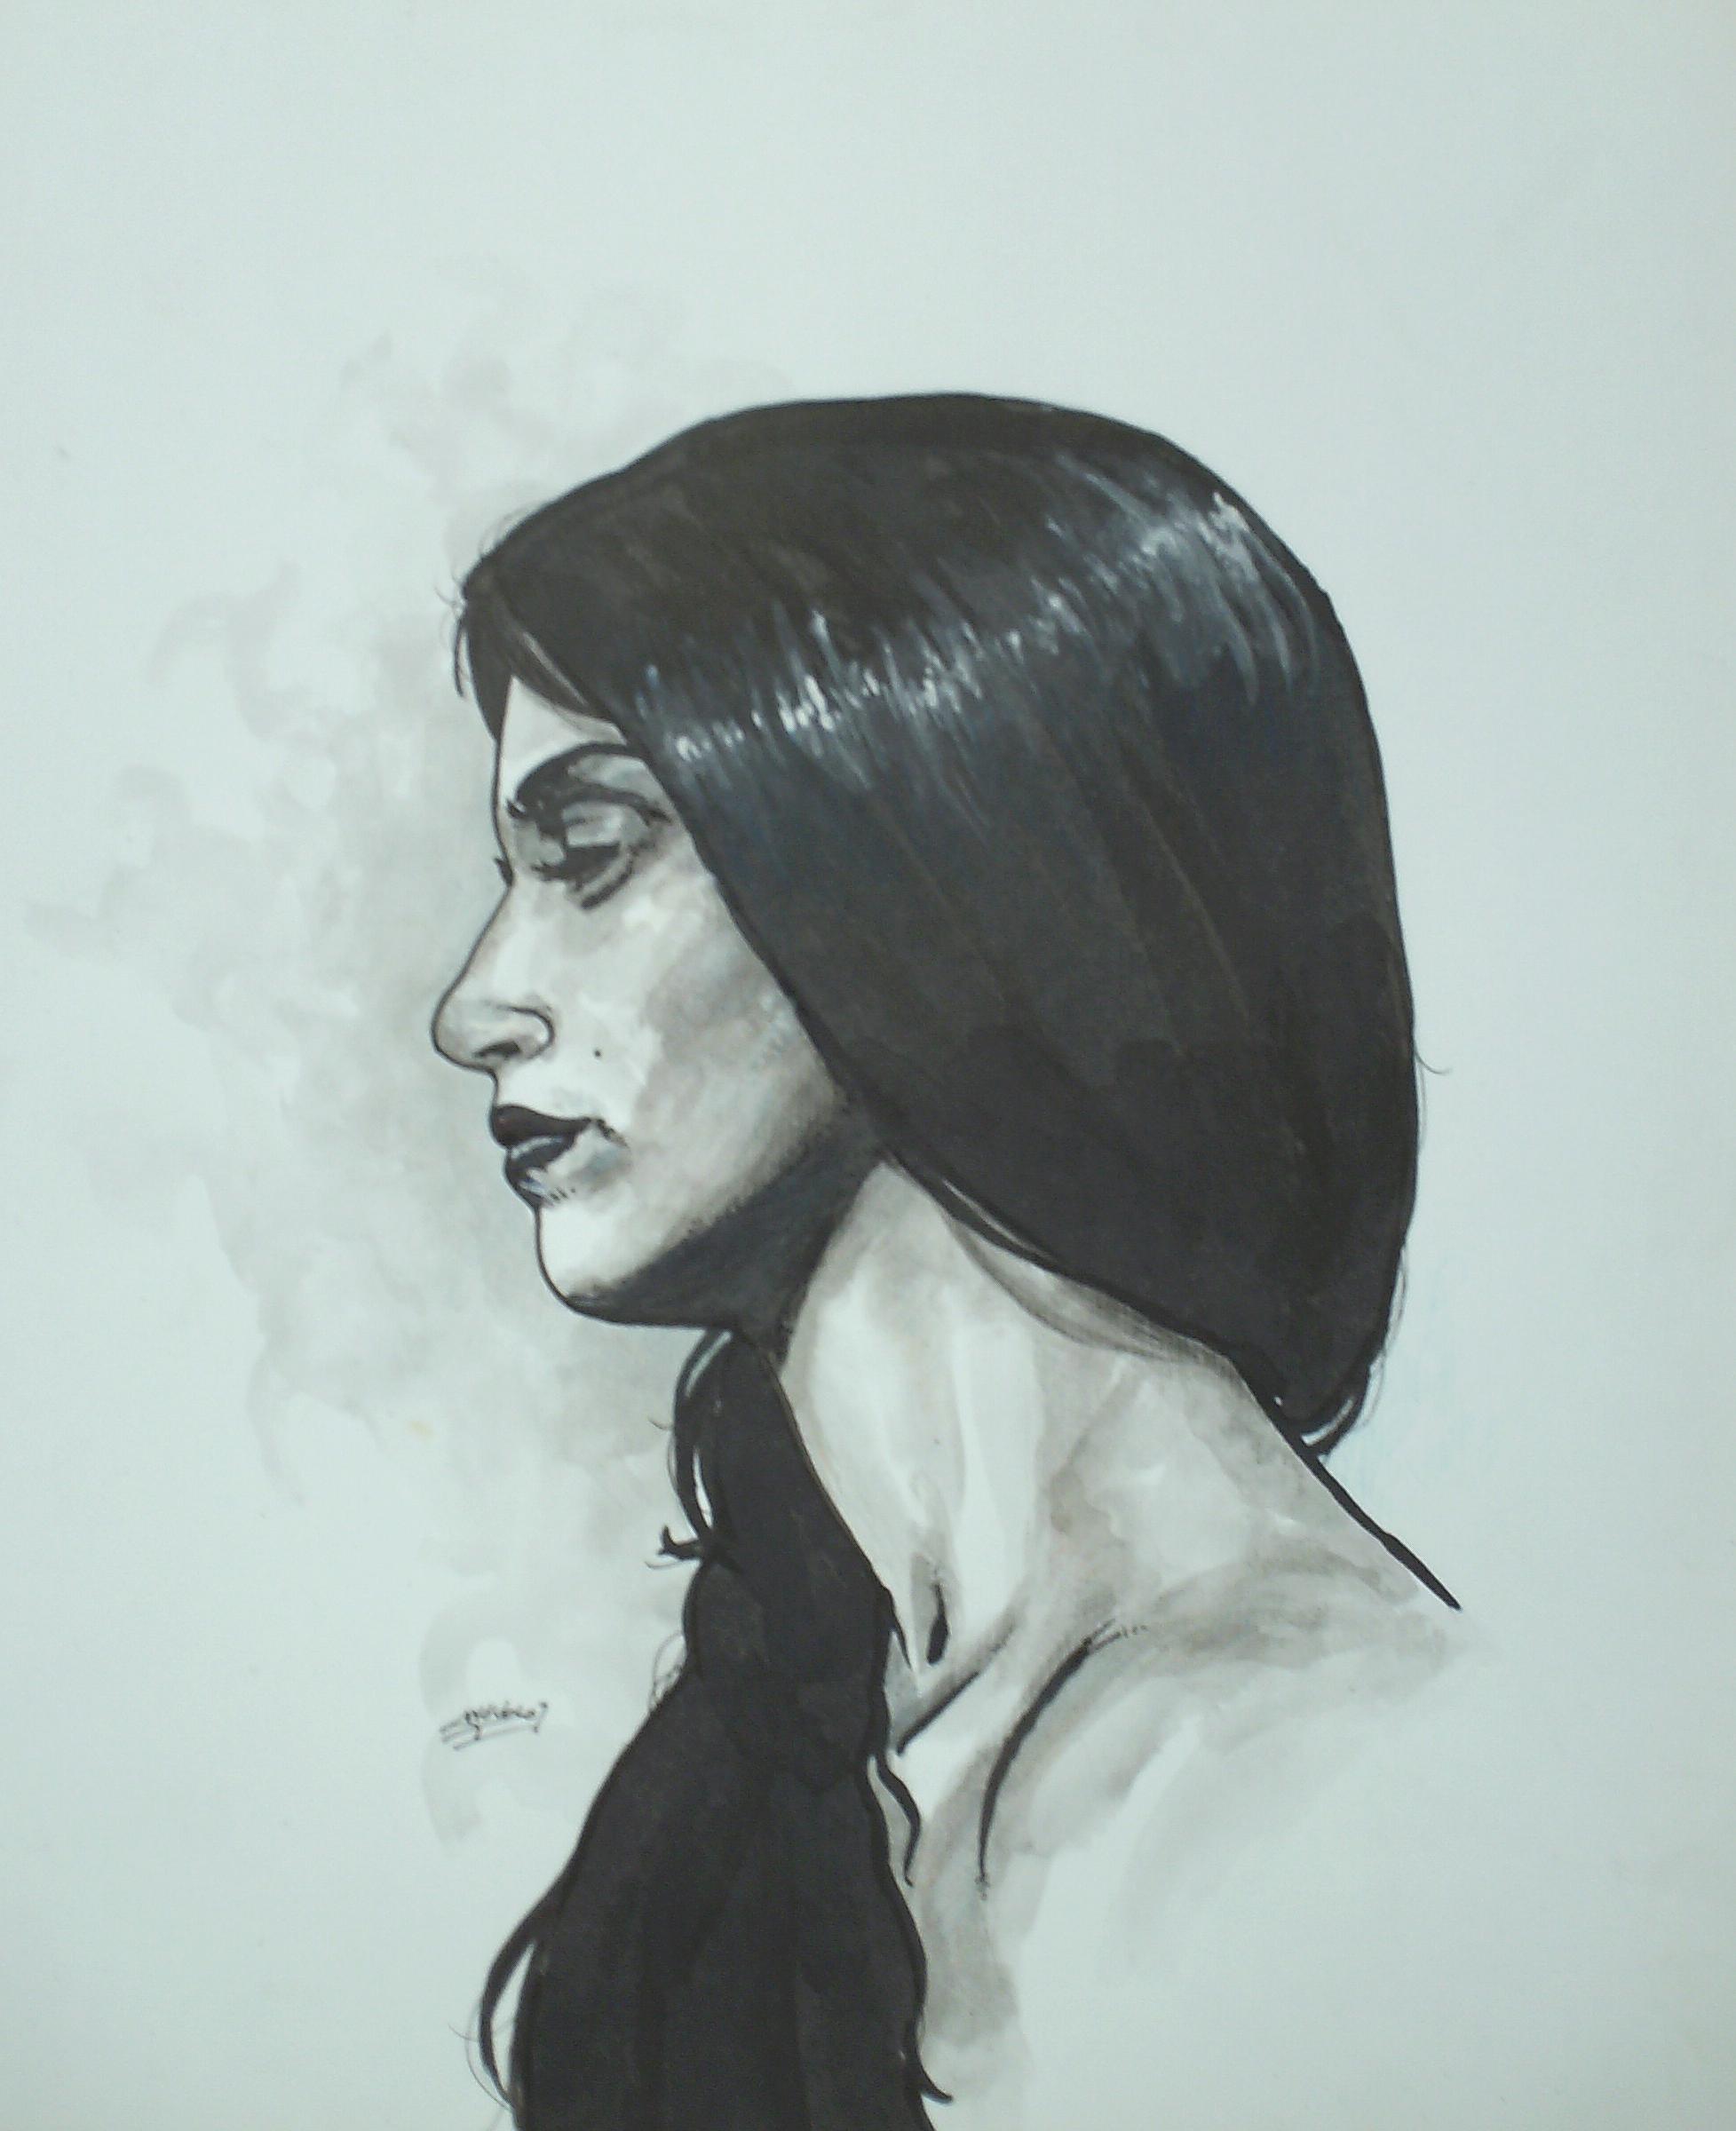 C novel dessins archive du blog profil - Profil dessin ...